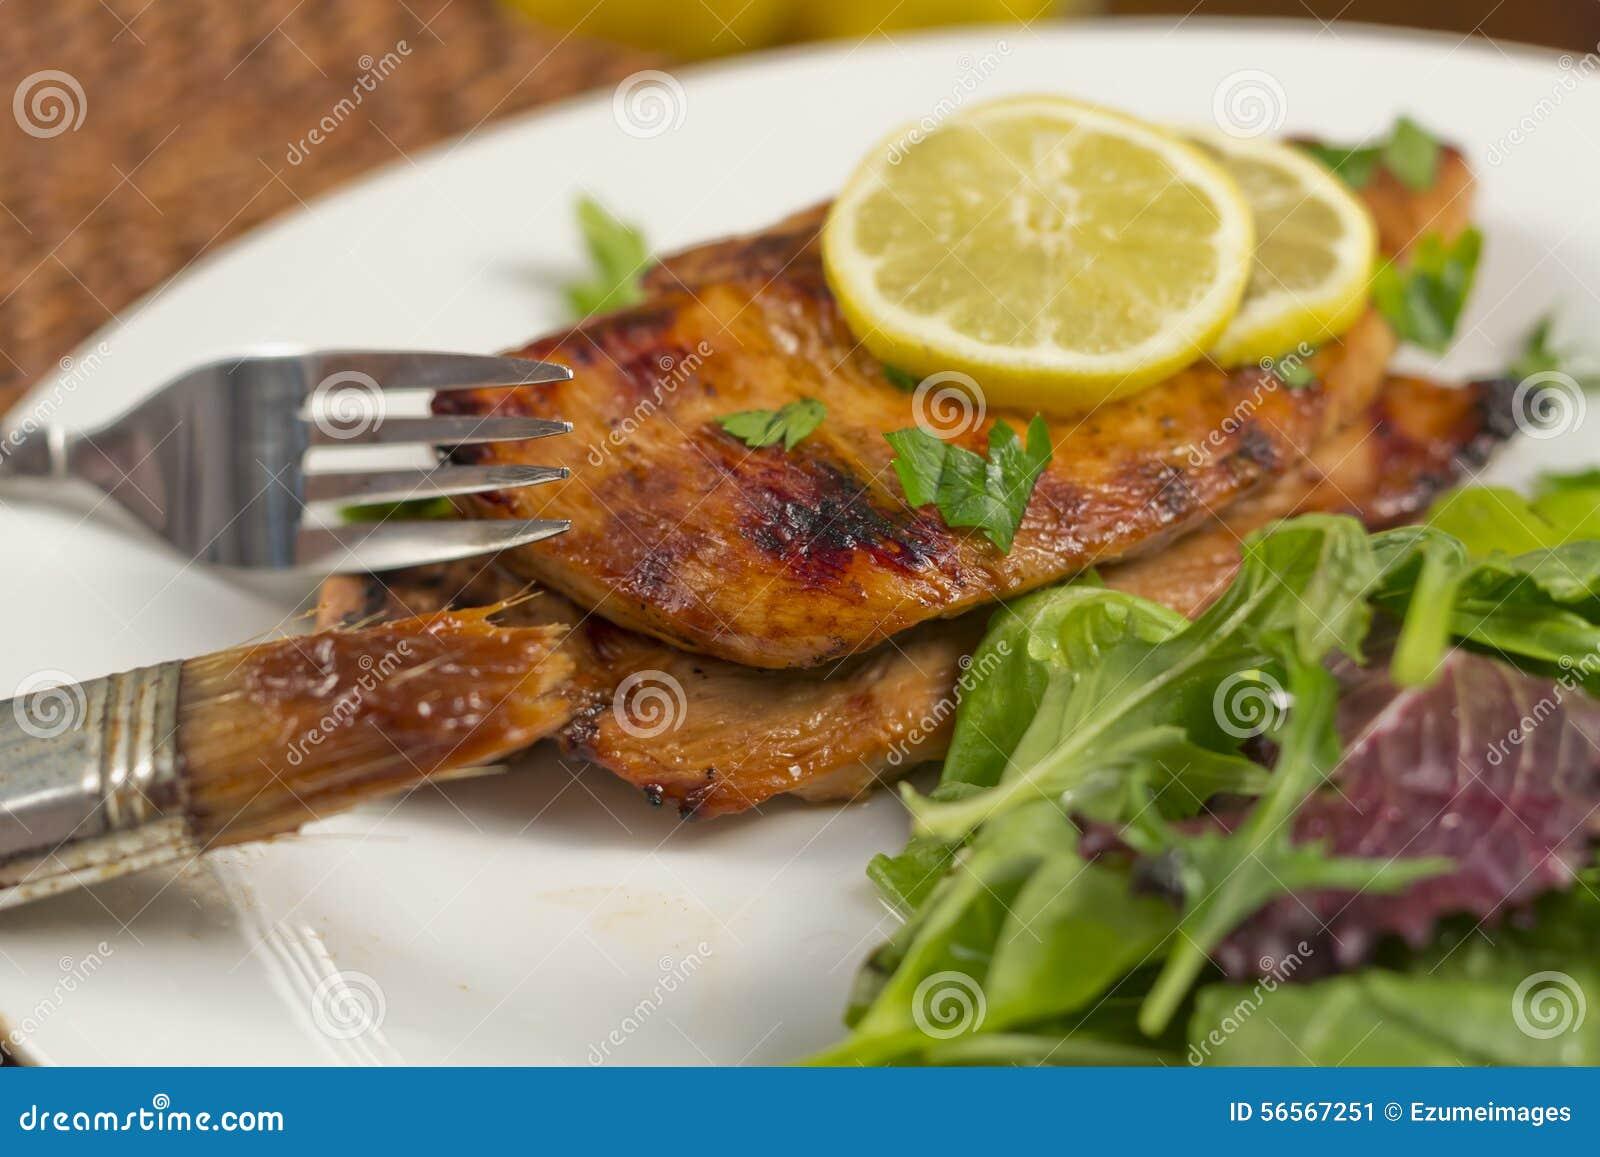 Download κοτόπουλο στηθών που ψήνεται στη σχάρα Στοκ Εικόνα - εικόνα από πουλερικά, εύκολος: 56567251